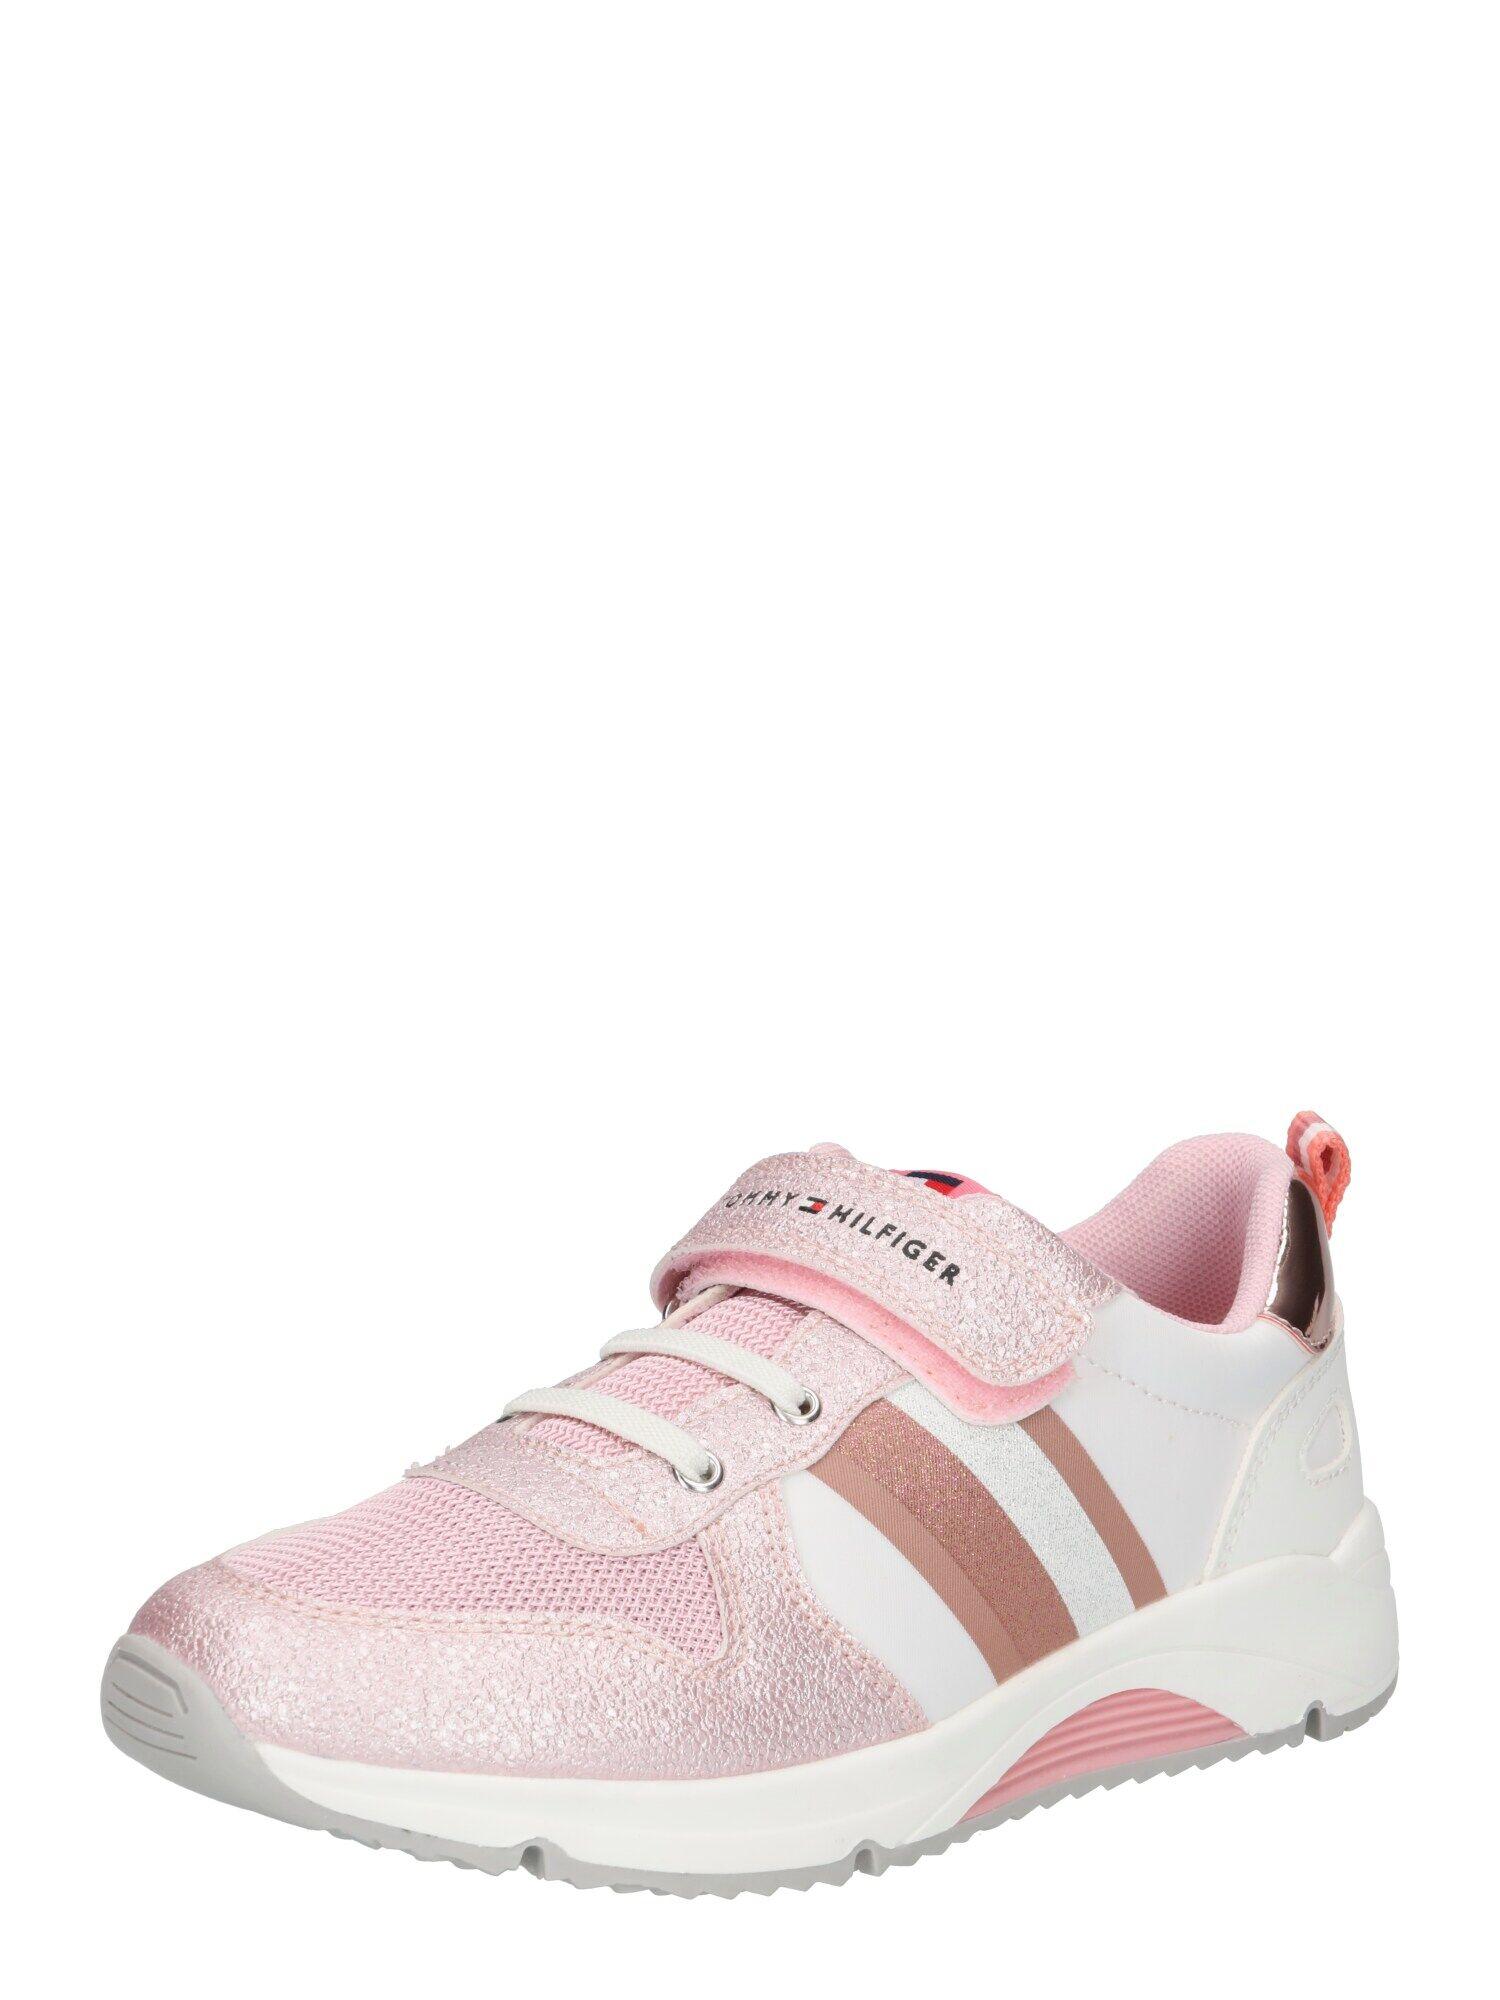 TOMMY HILFIGER Sneaker 'Velcro' Rosa